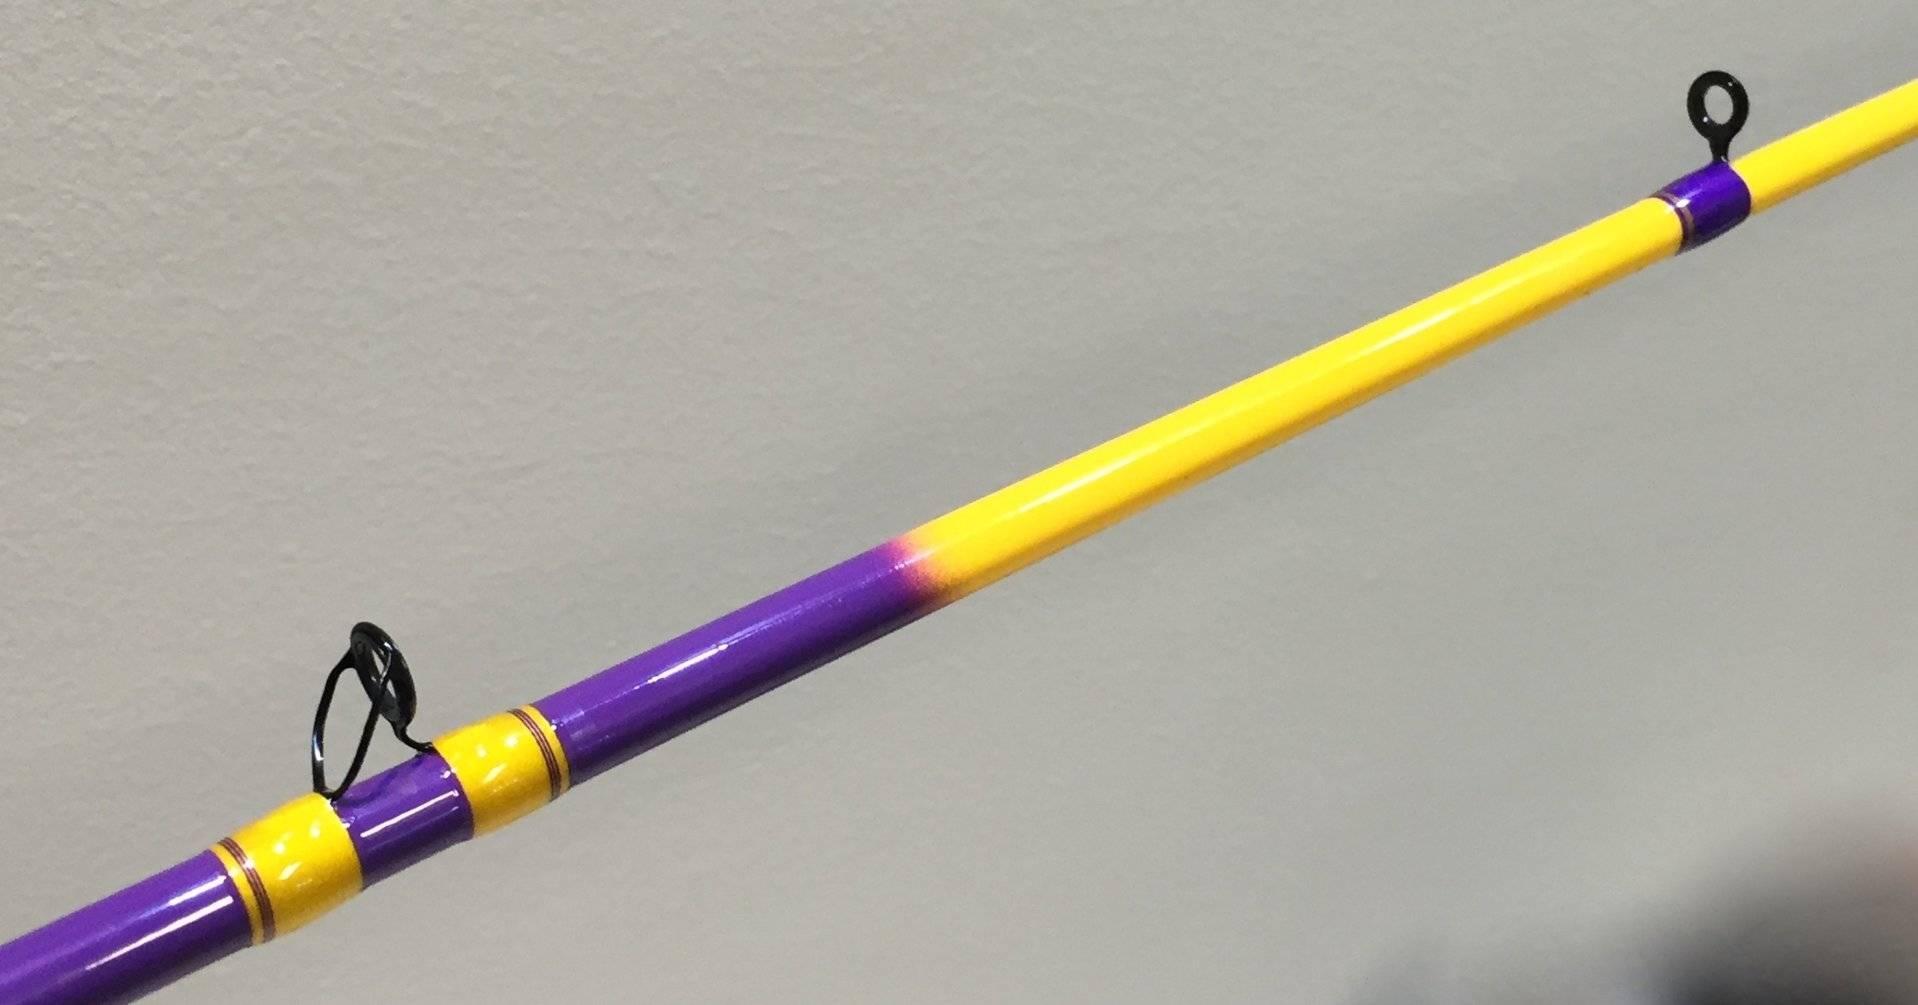 Lsu rod 2 saltwater fishing forums for Purple fishing rod